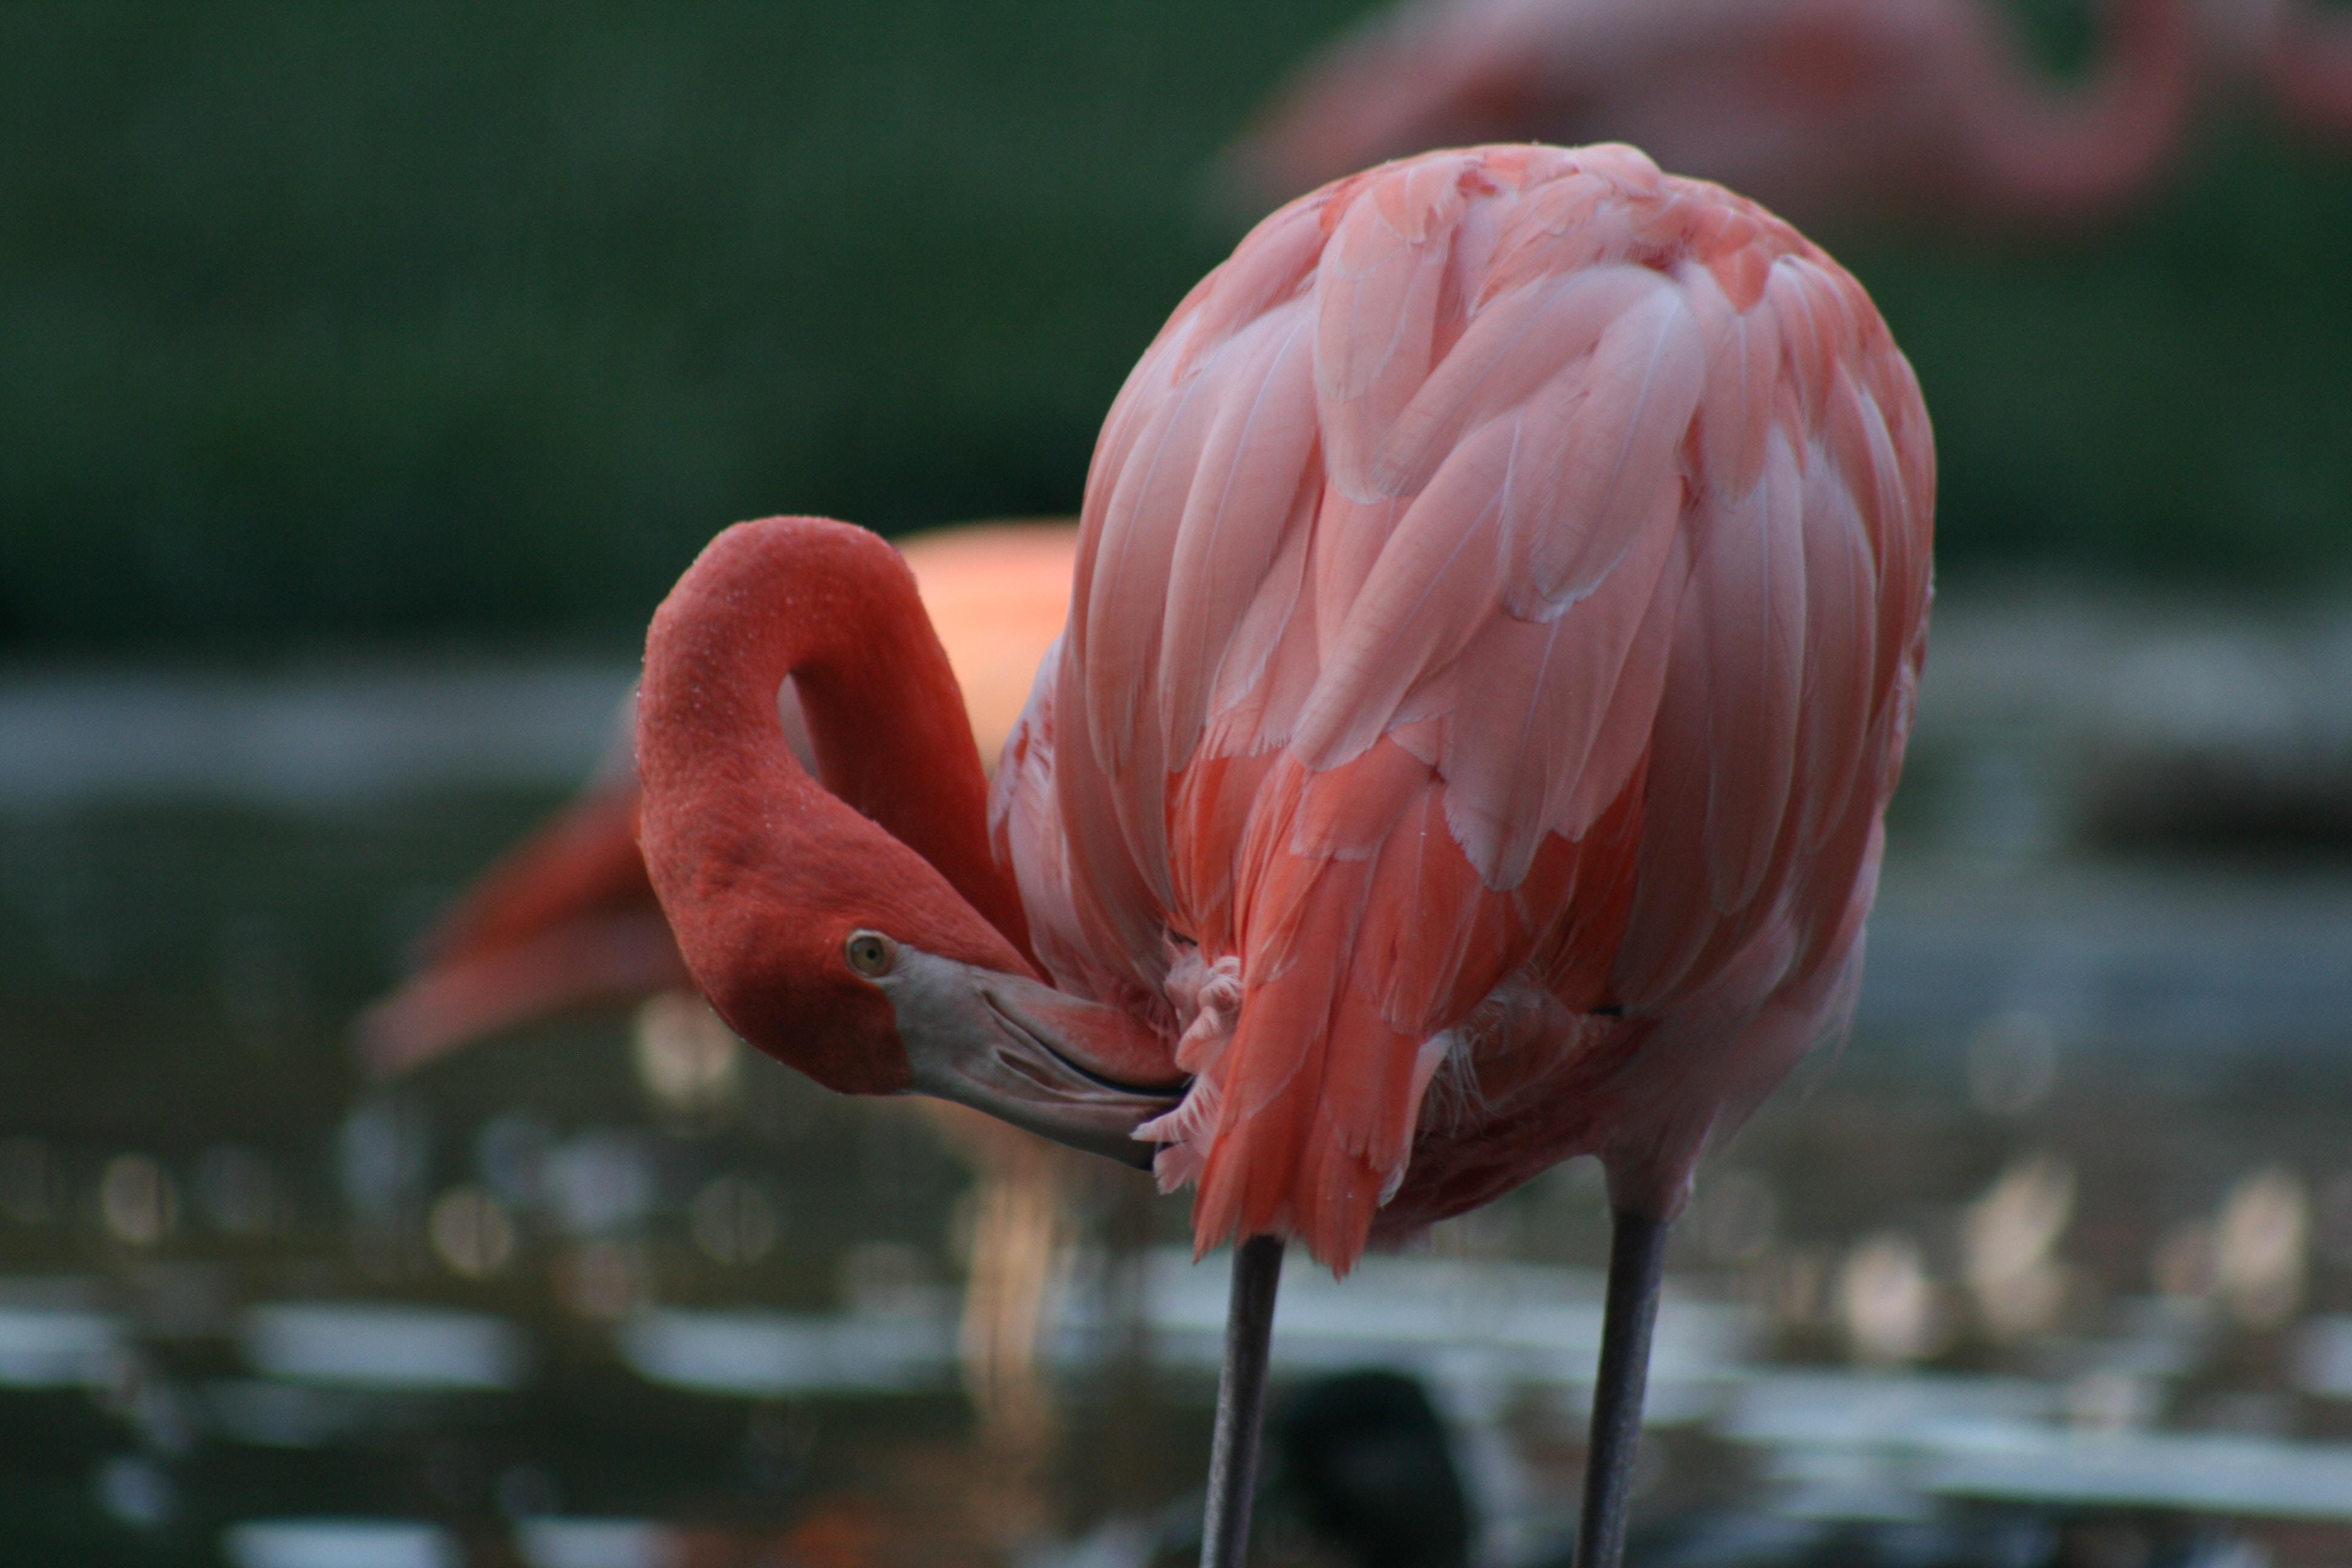 pink flamingo touching its own leg with beak